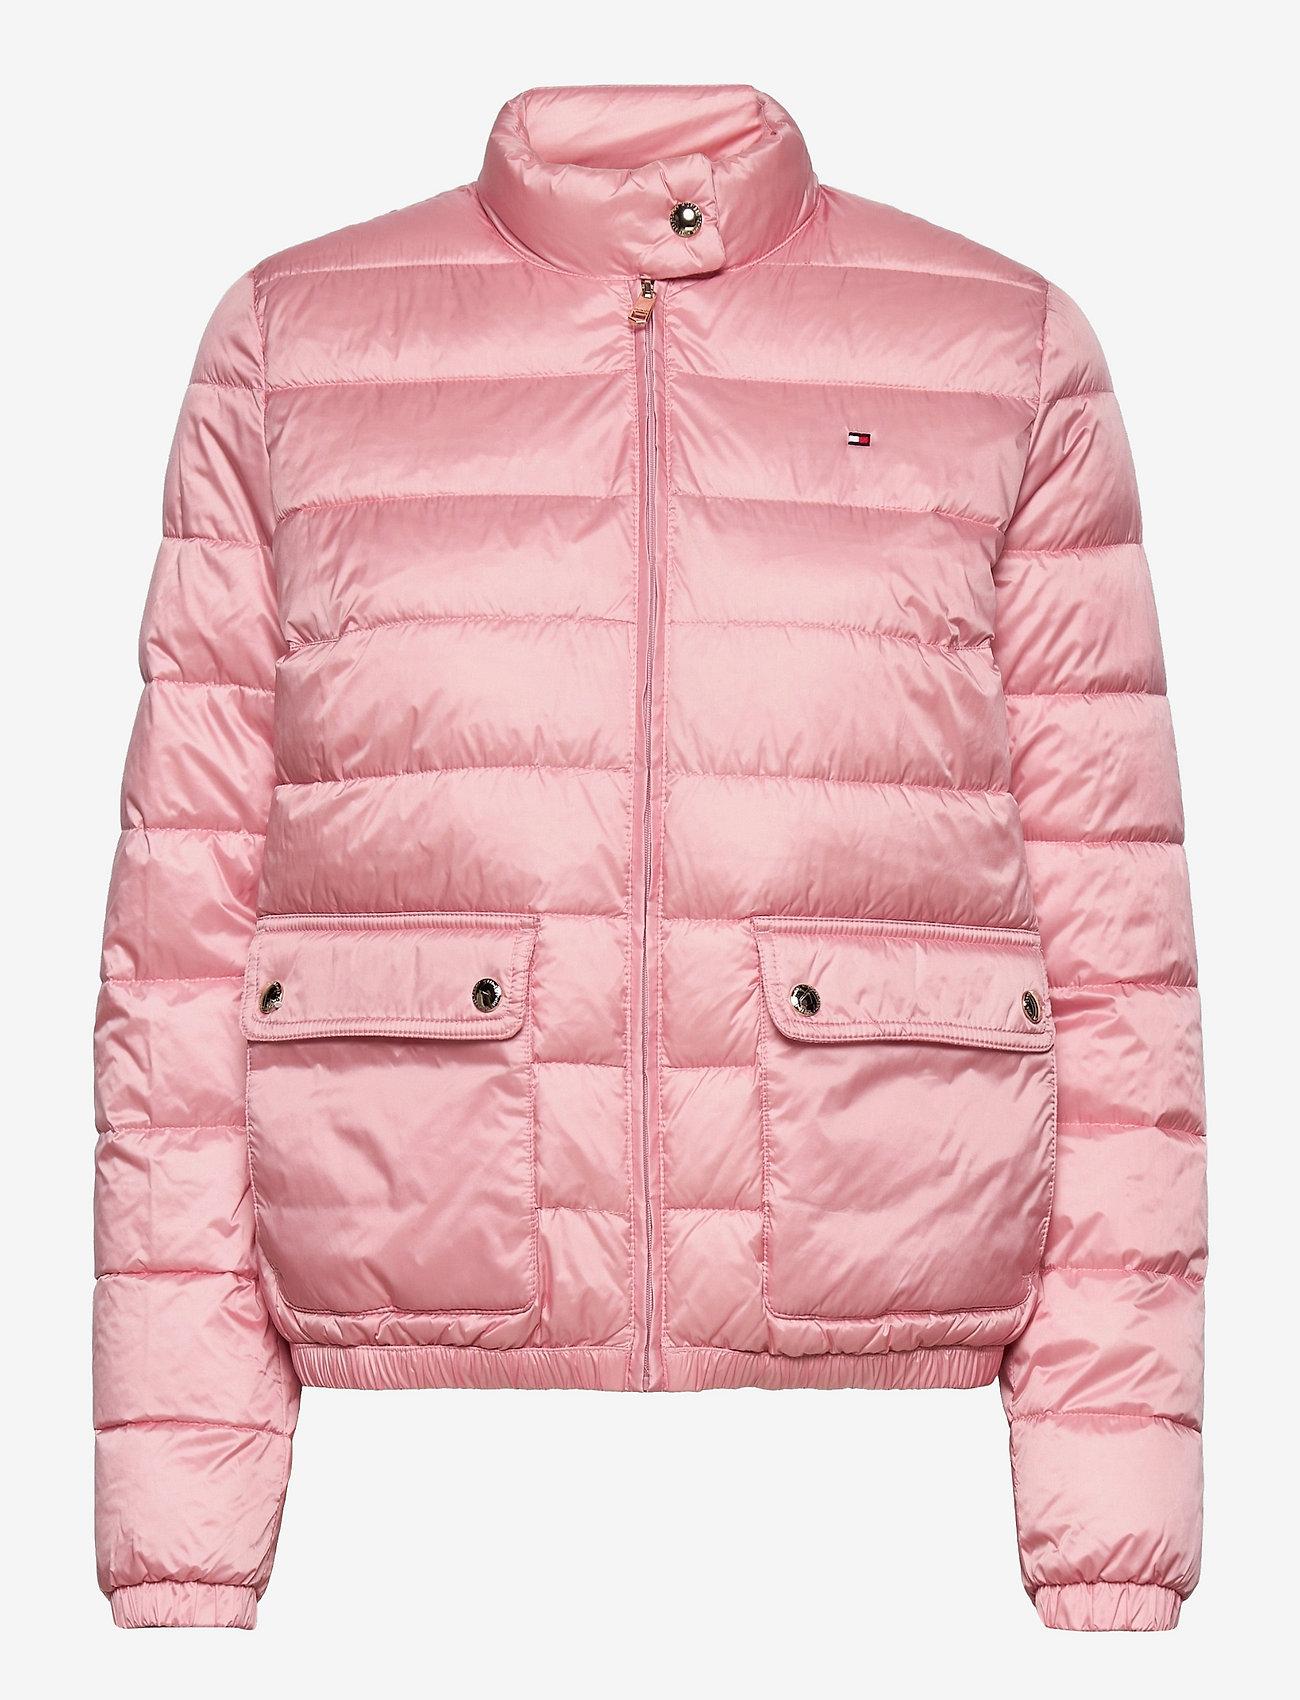 Tommy Hilfiger - NYLON LW PADDED JACKET - winter jackets - glacier pink - 0